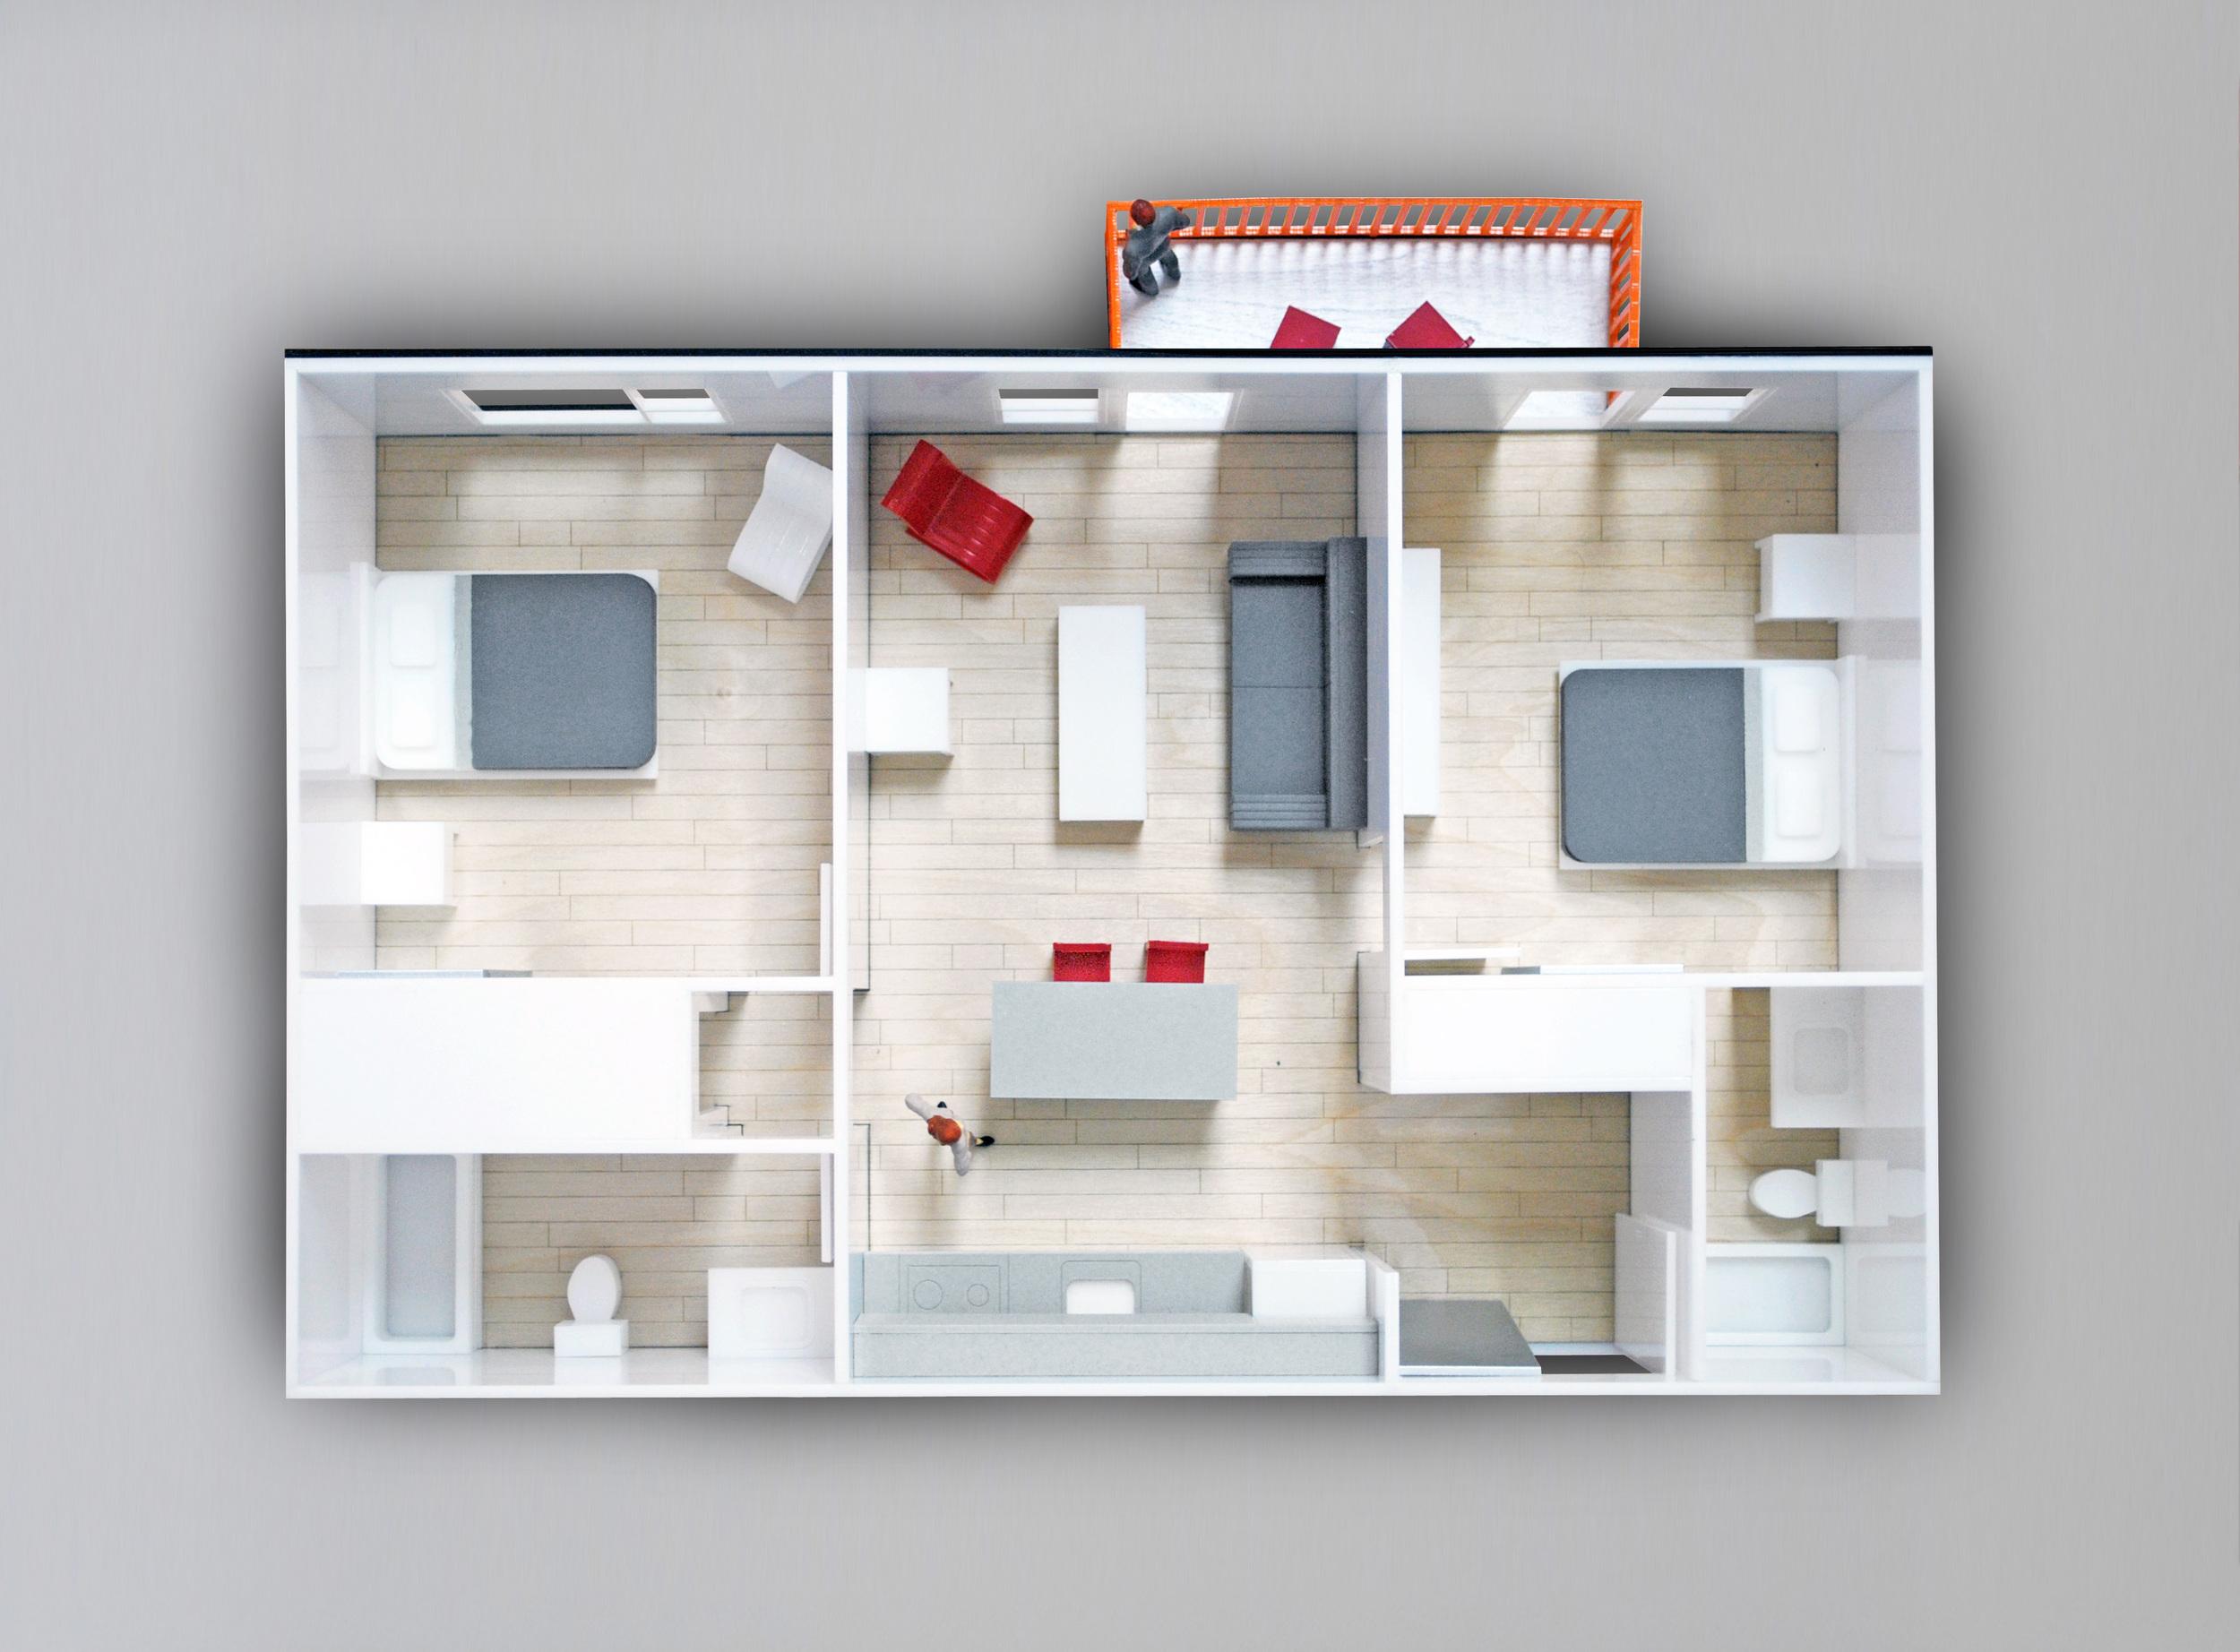 moco model plan_o.jpg